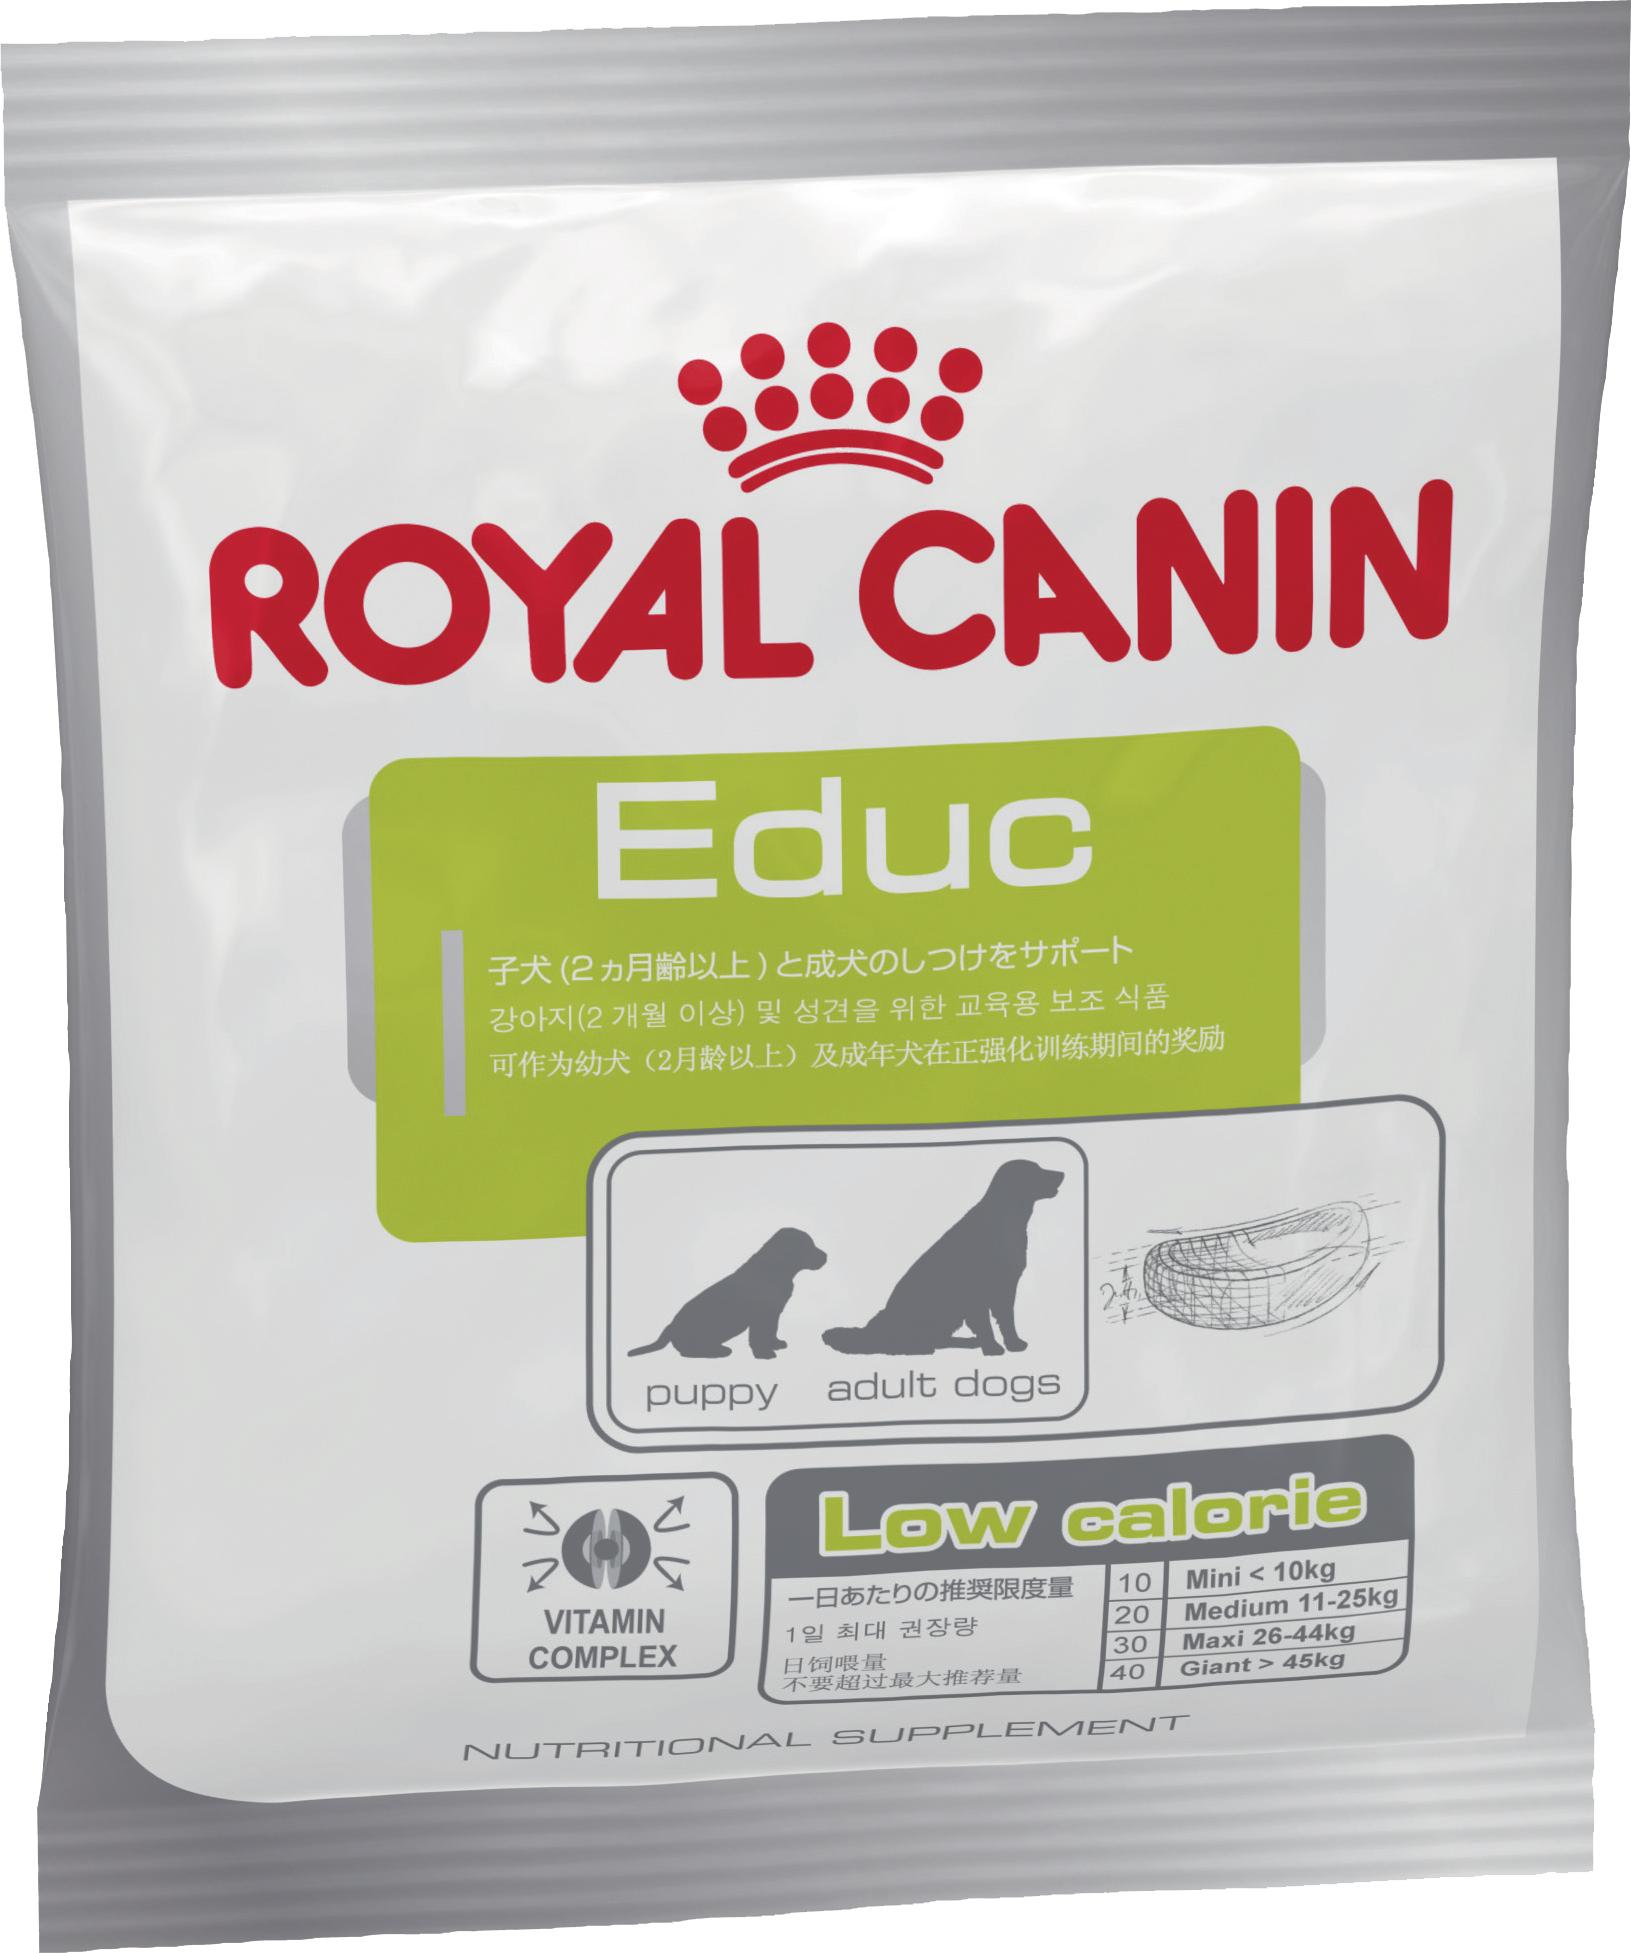 Hundgodis Royal Canin Educ, 50 g